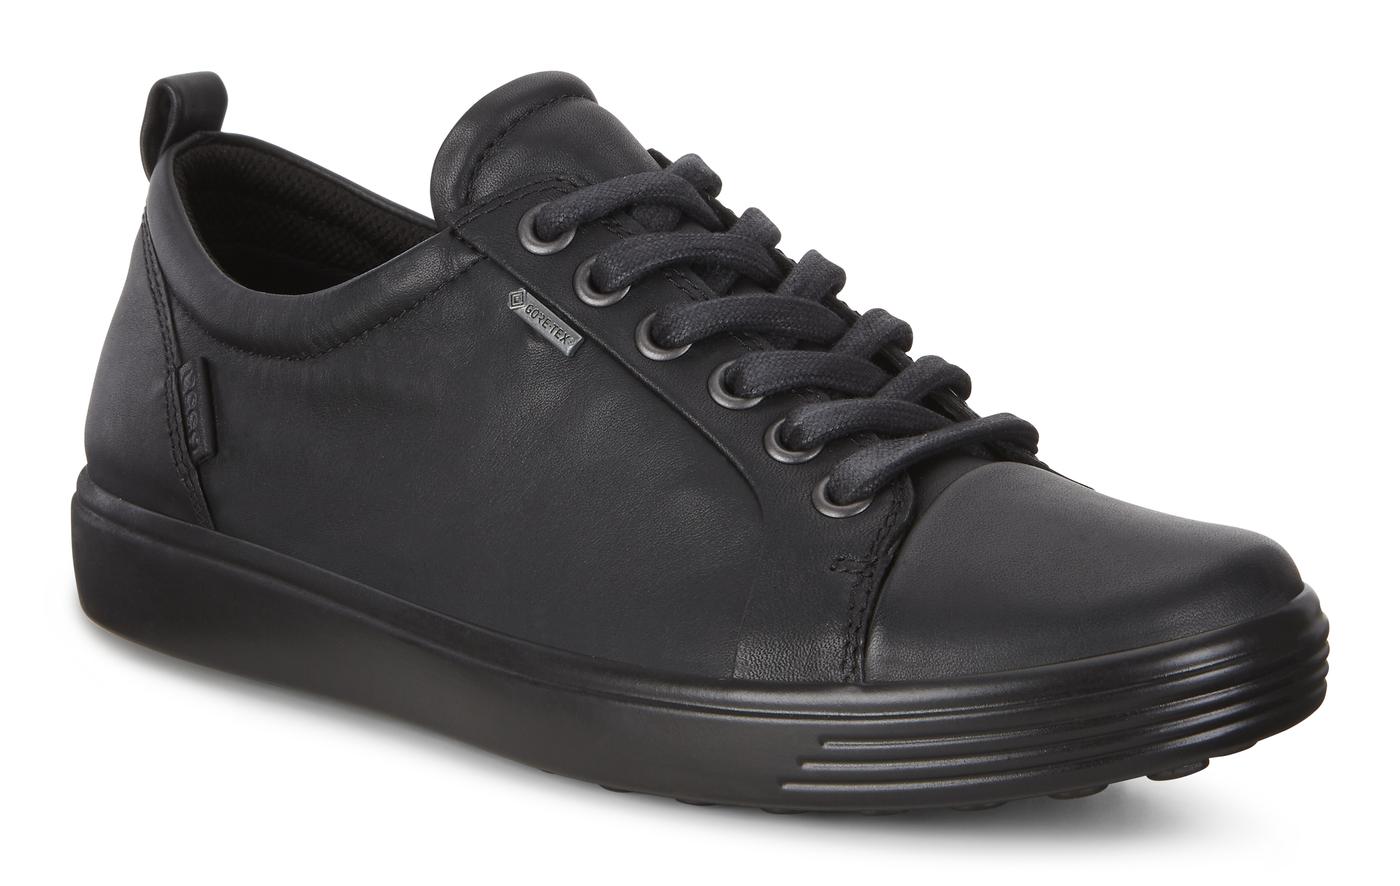 ECCO SOFT7 Womens Sneaker GTX Lace